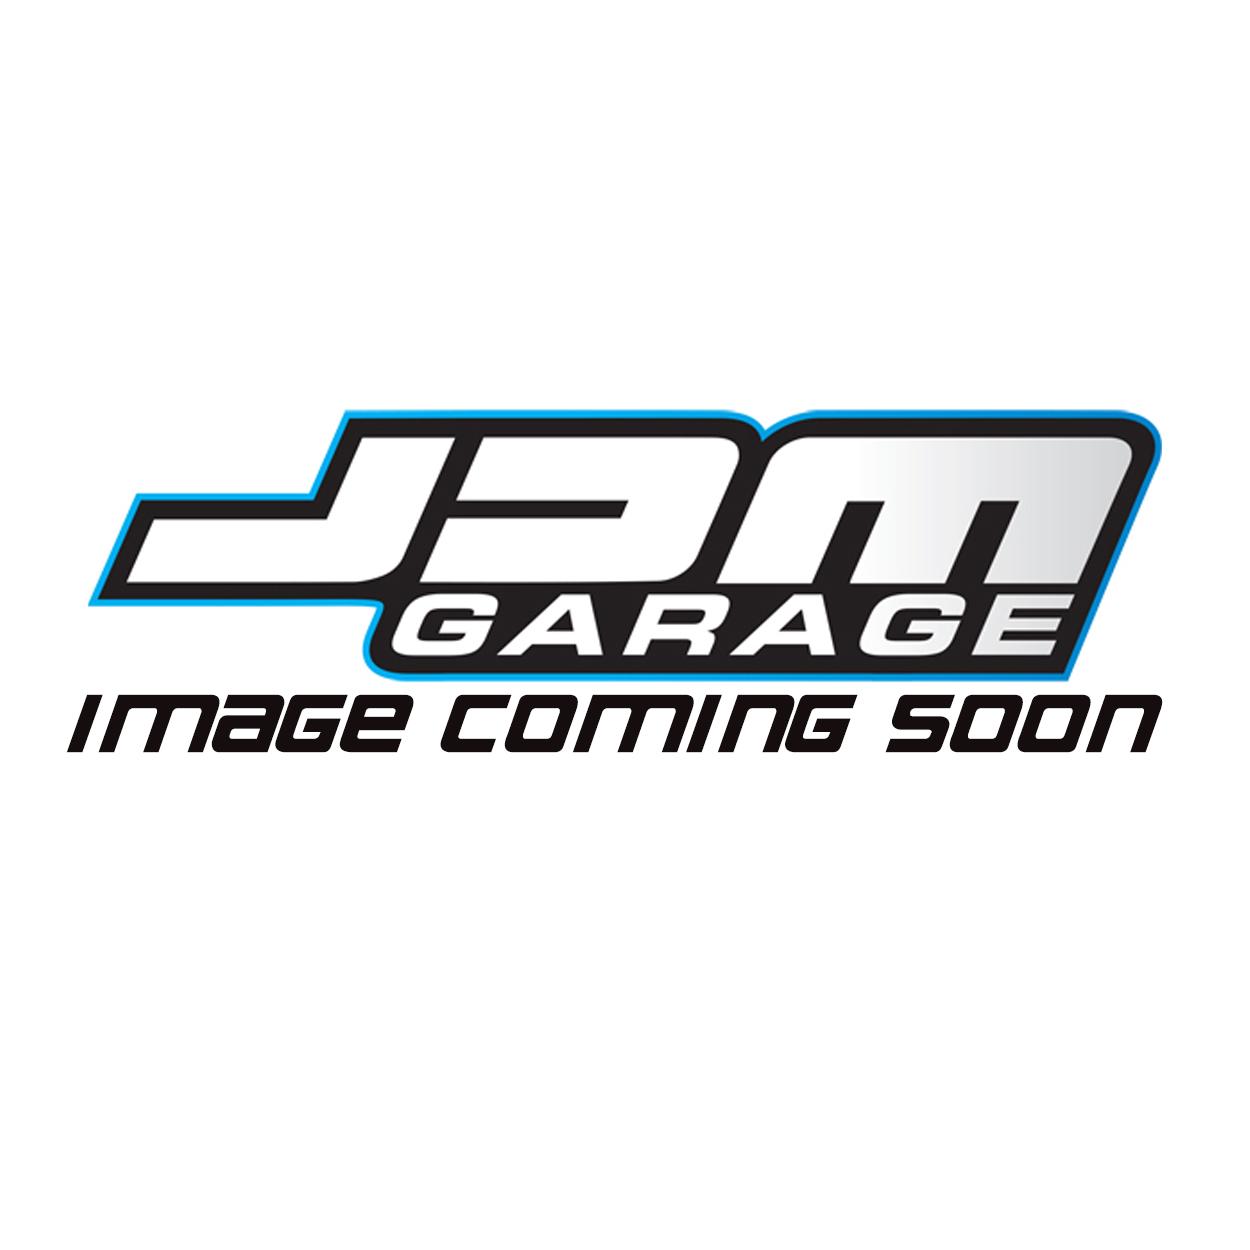 OE Replacement Water Pump Kit - Toyota Chaser Soarer Supra Aristo JZA80 Aristo Supra 2JZ-GTE